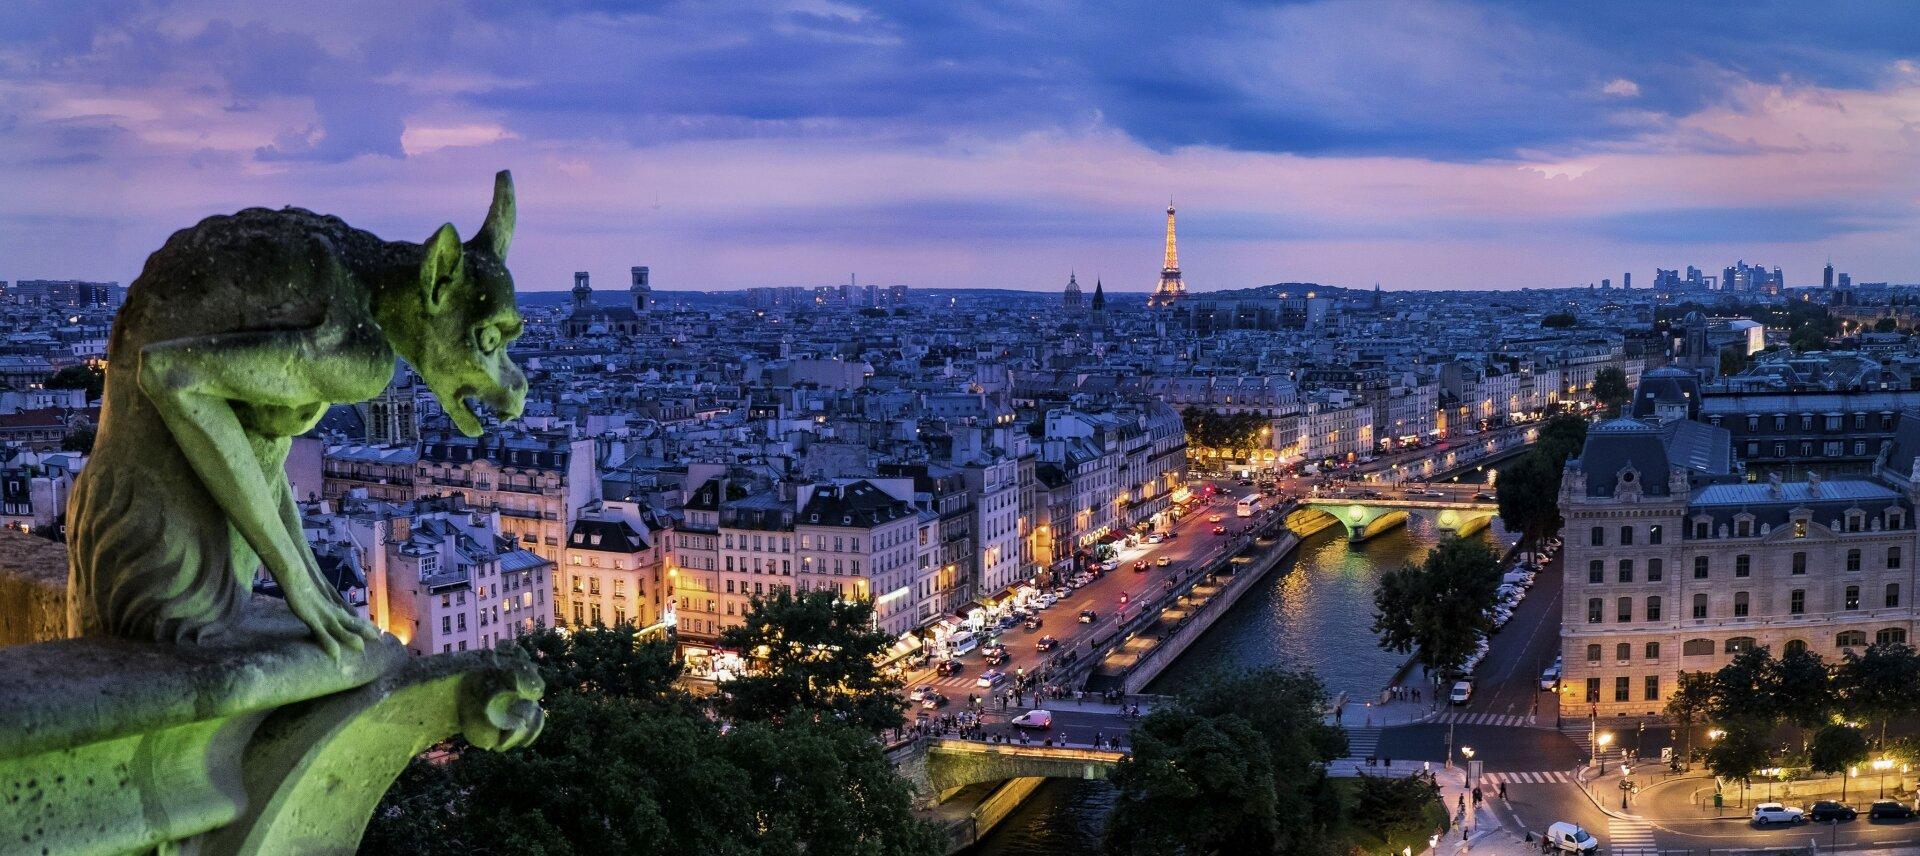 Mobile Storytelling Workshop in Paris October 19-20 -